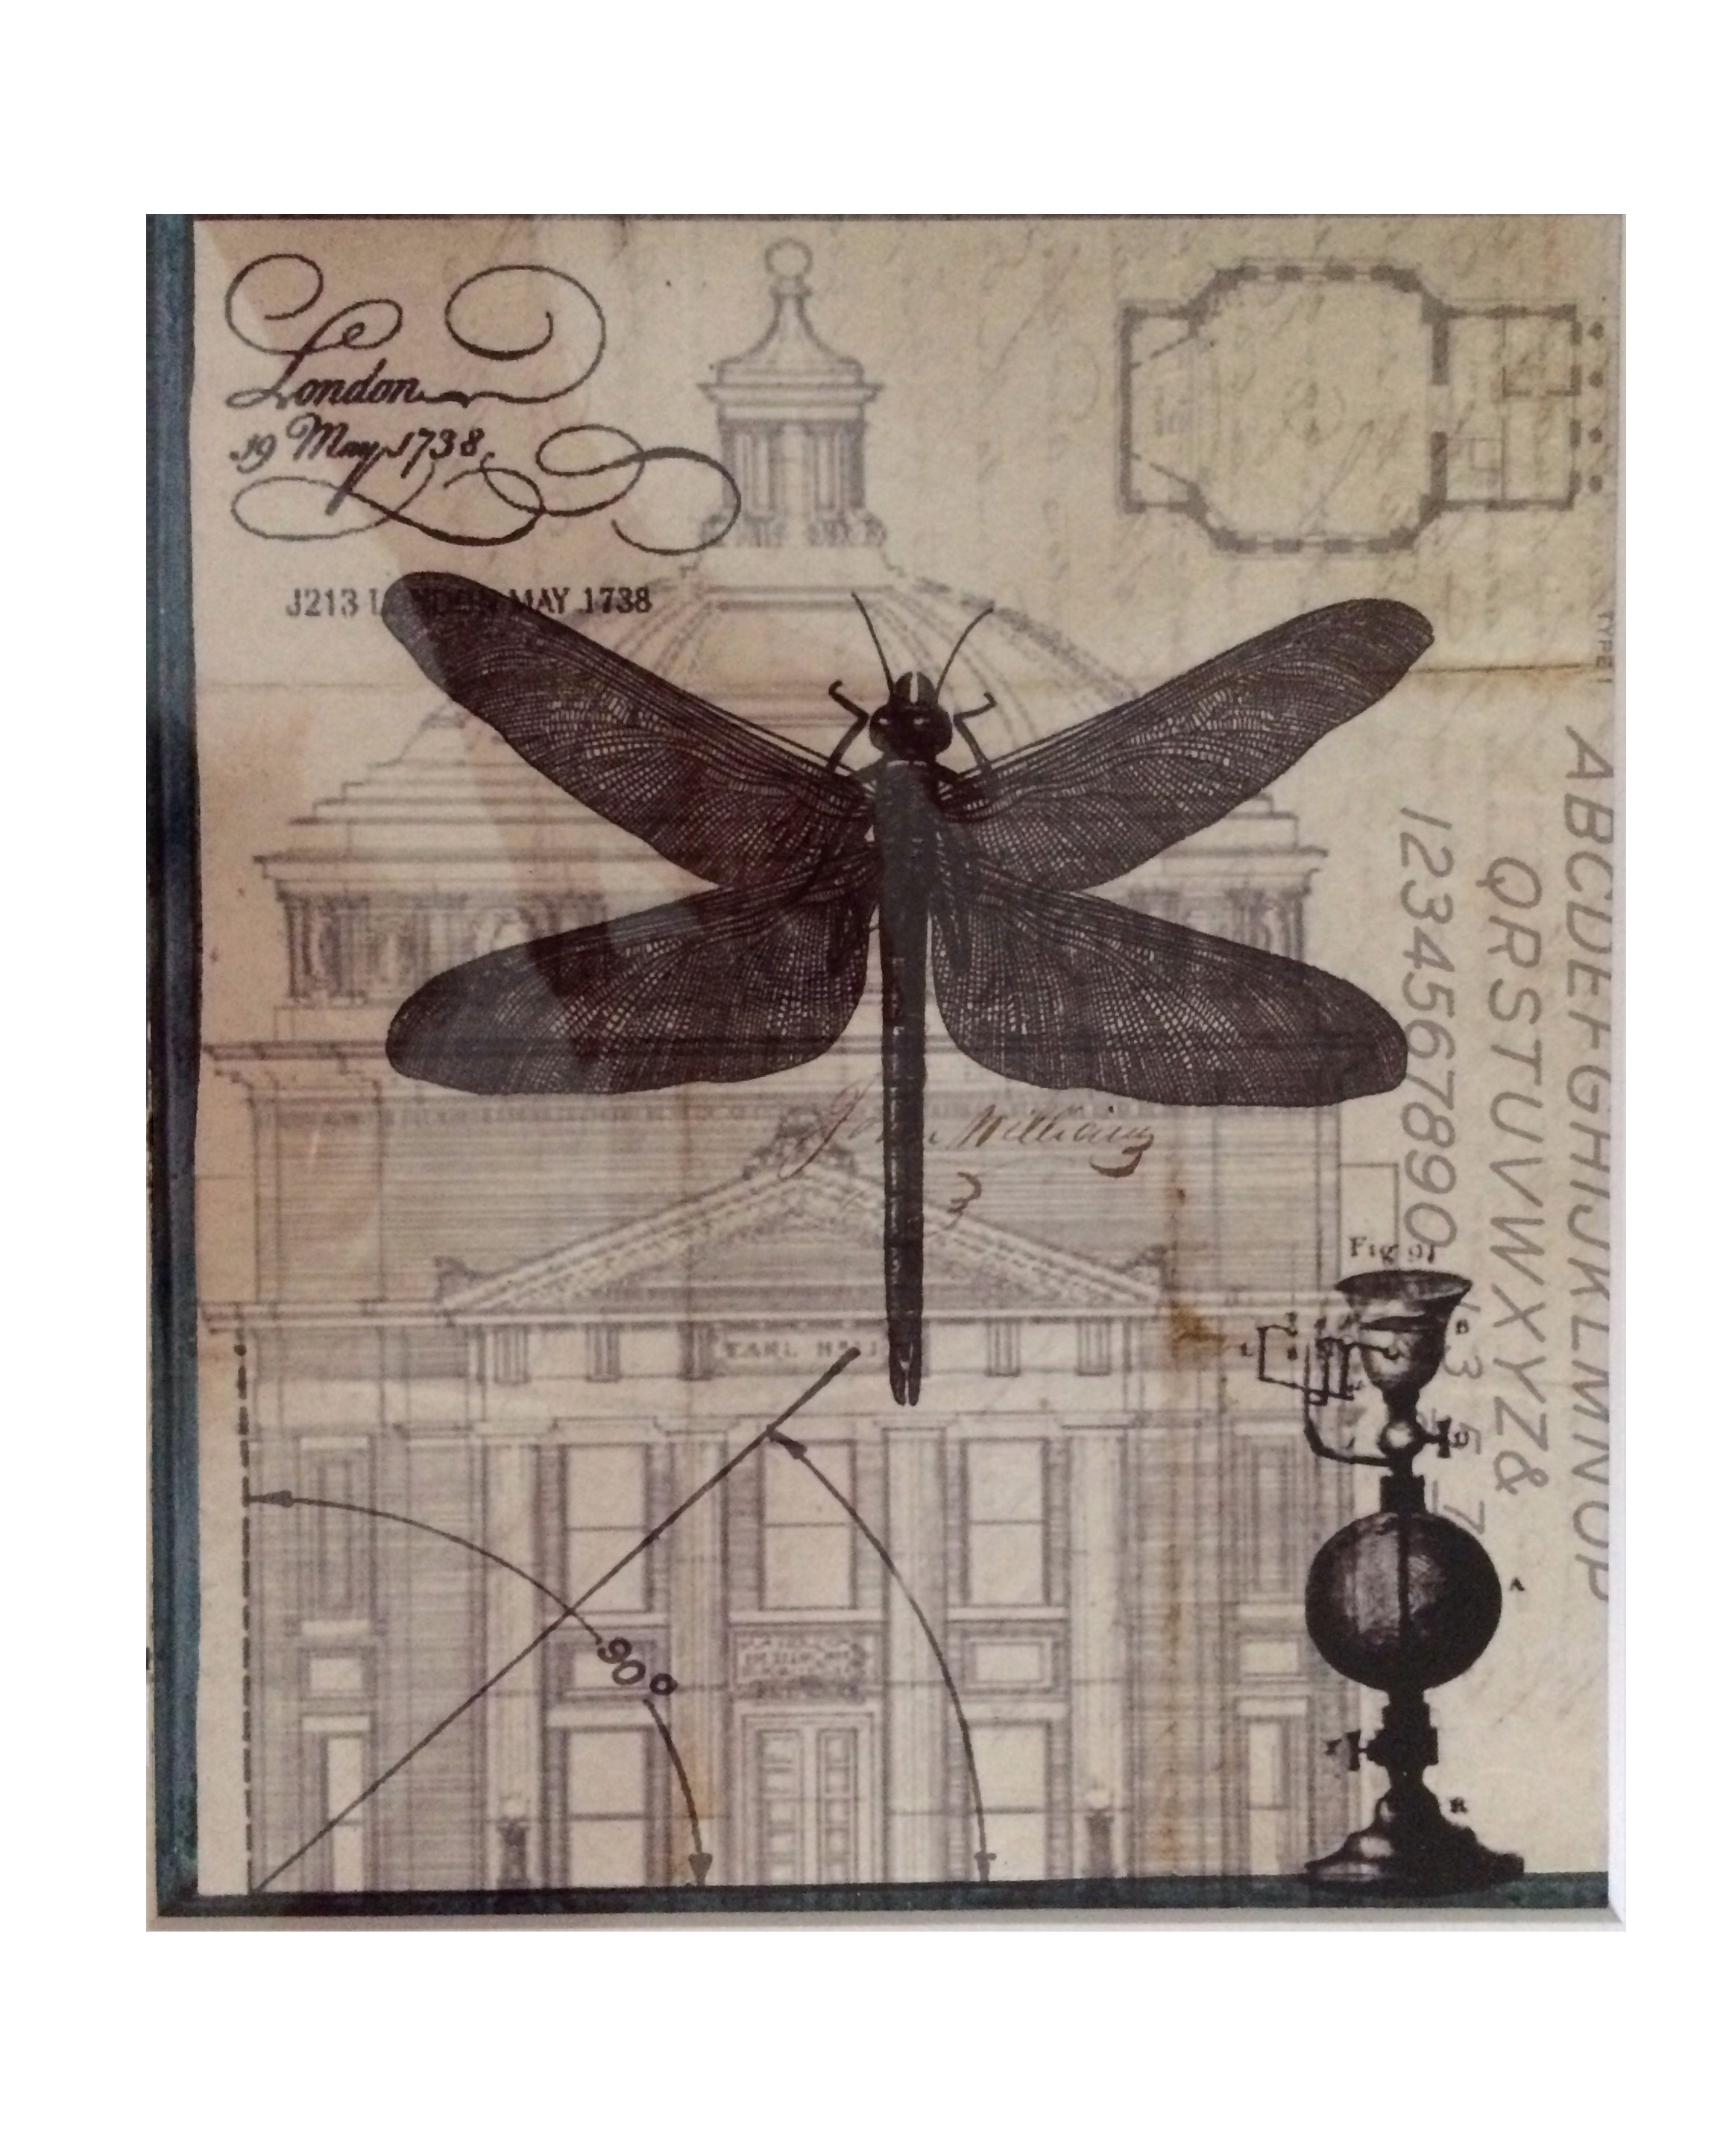 Billie Robson, print IV, 14x11, $125